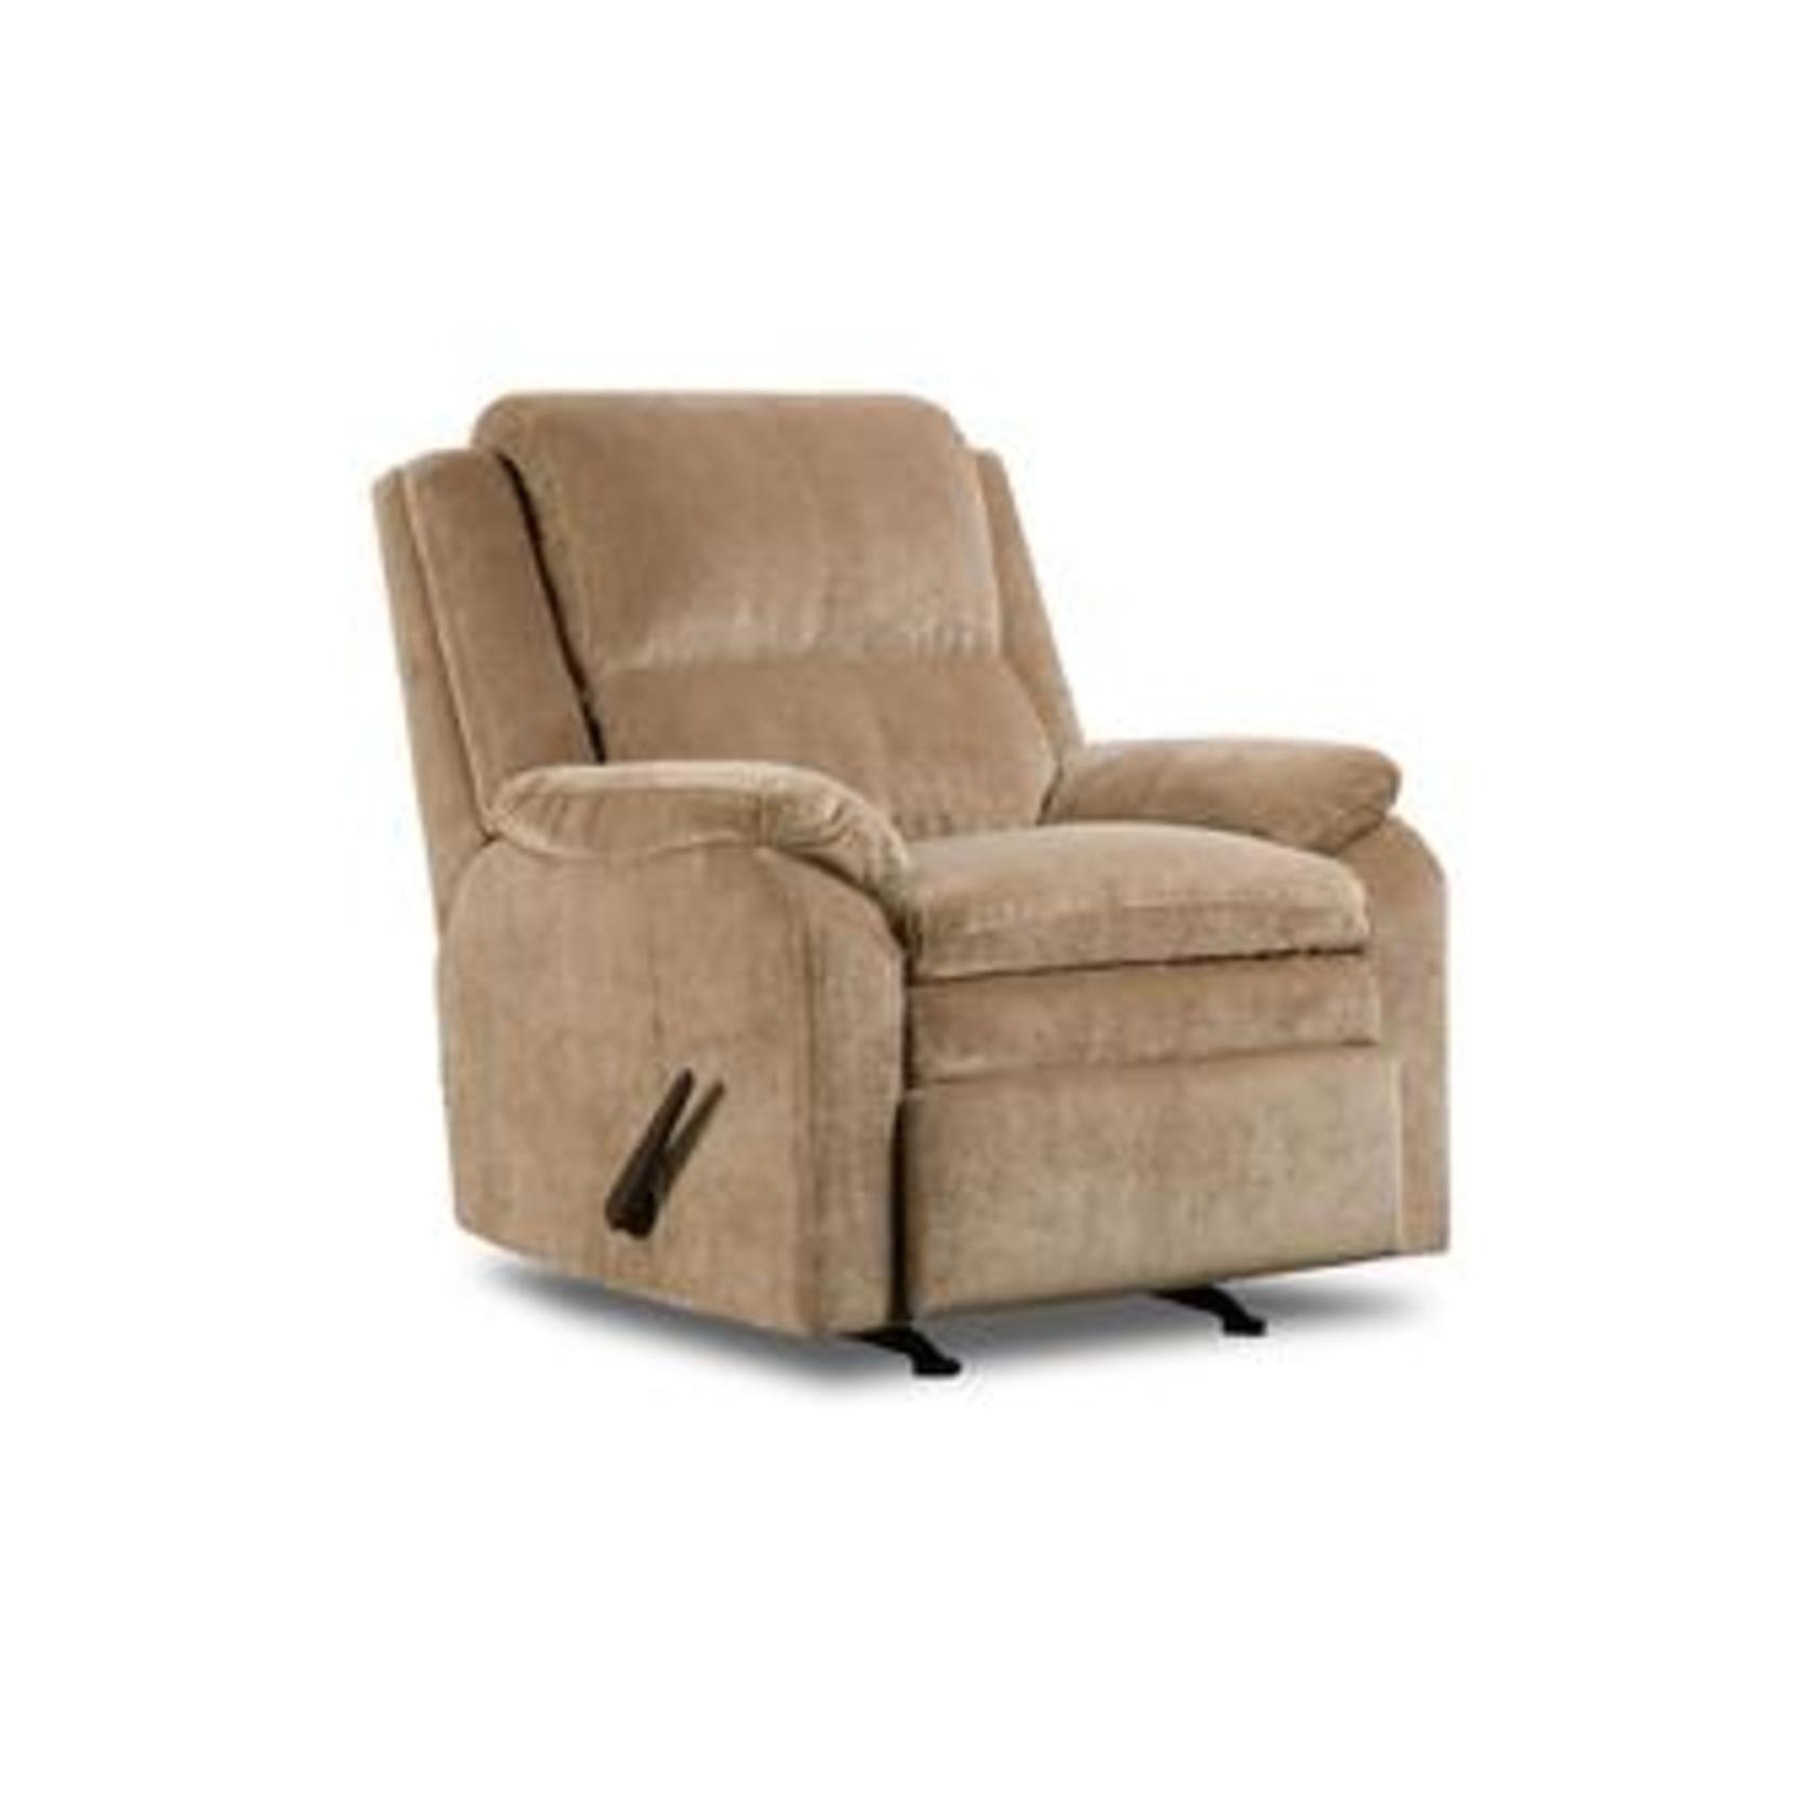 sears recliner chair covers massage pad simmons upholstery tan bixby ii high back rocker